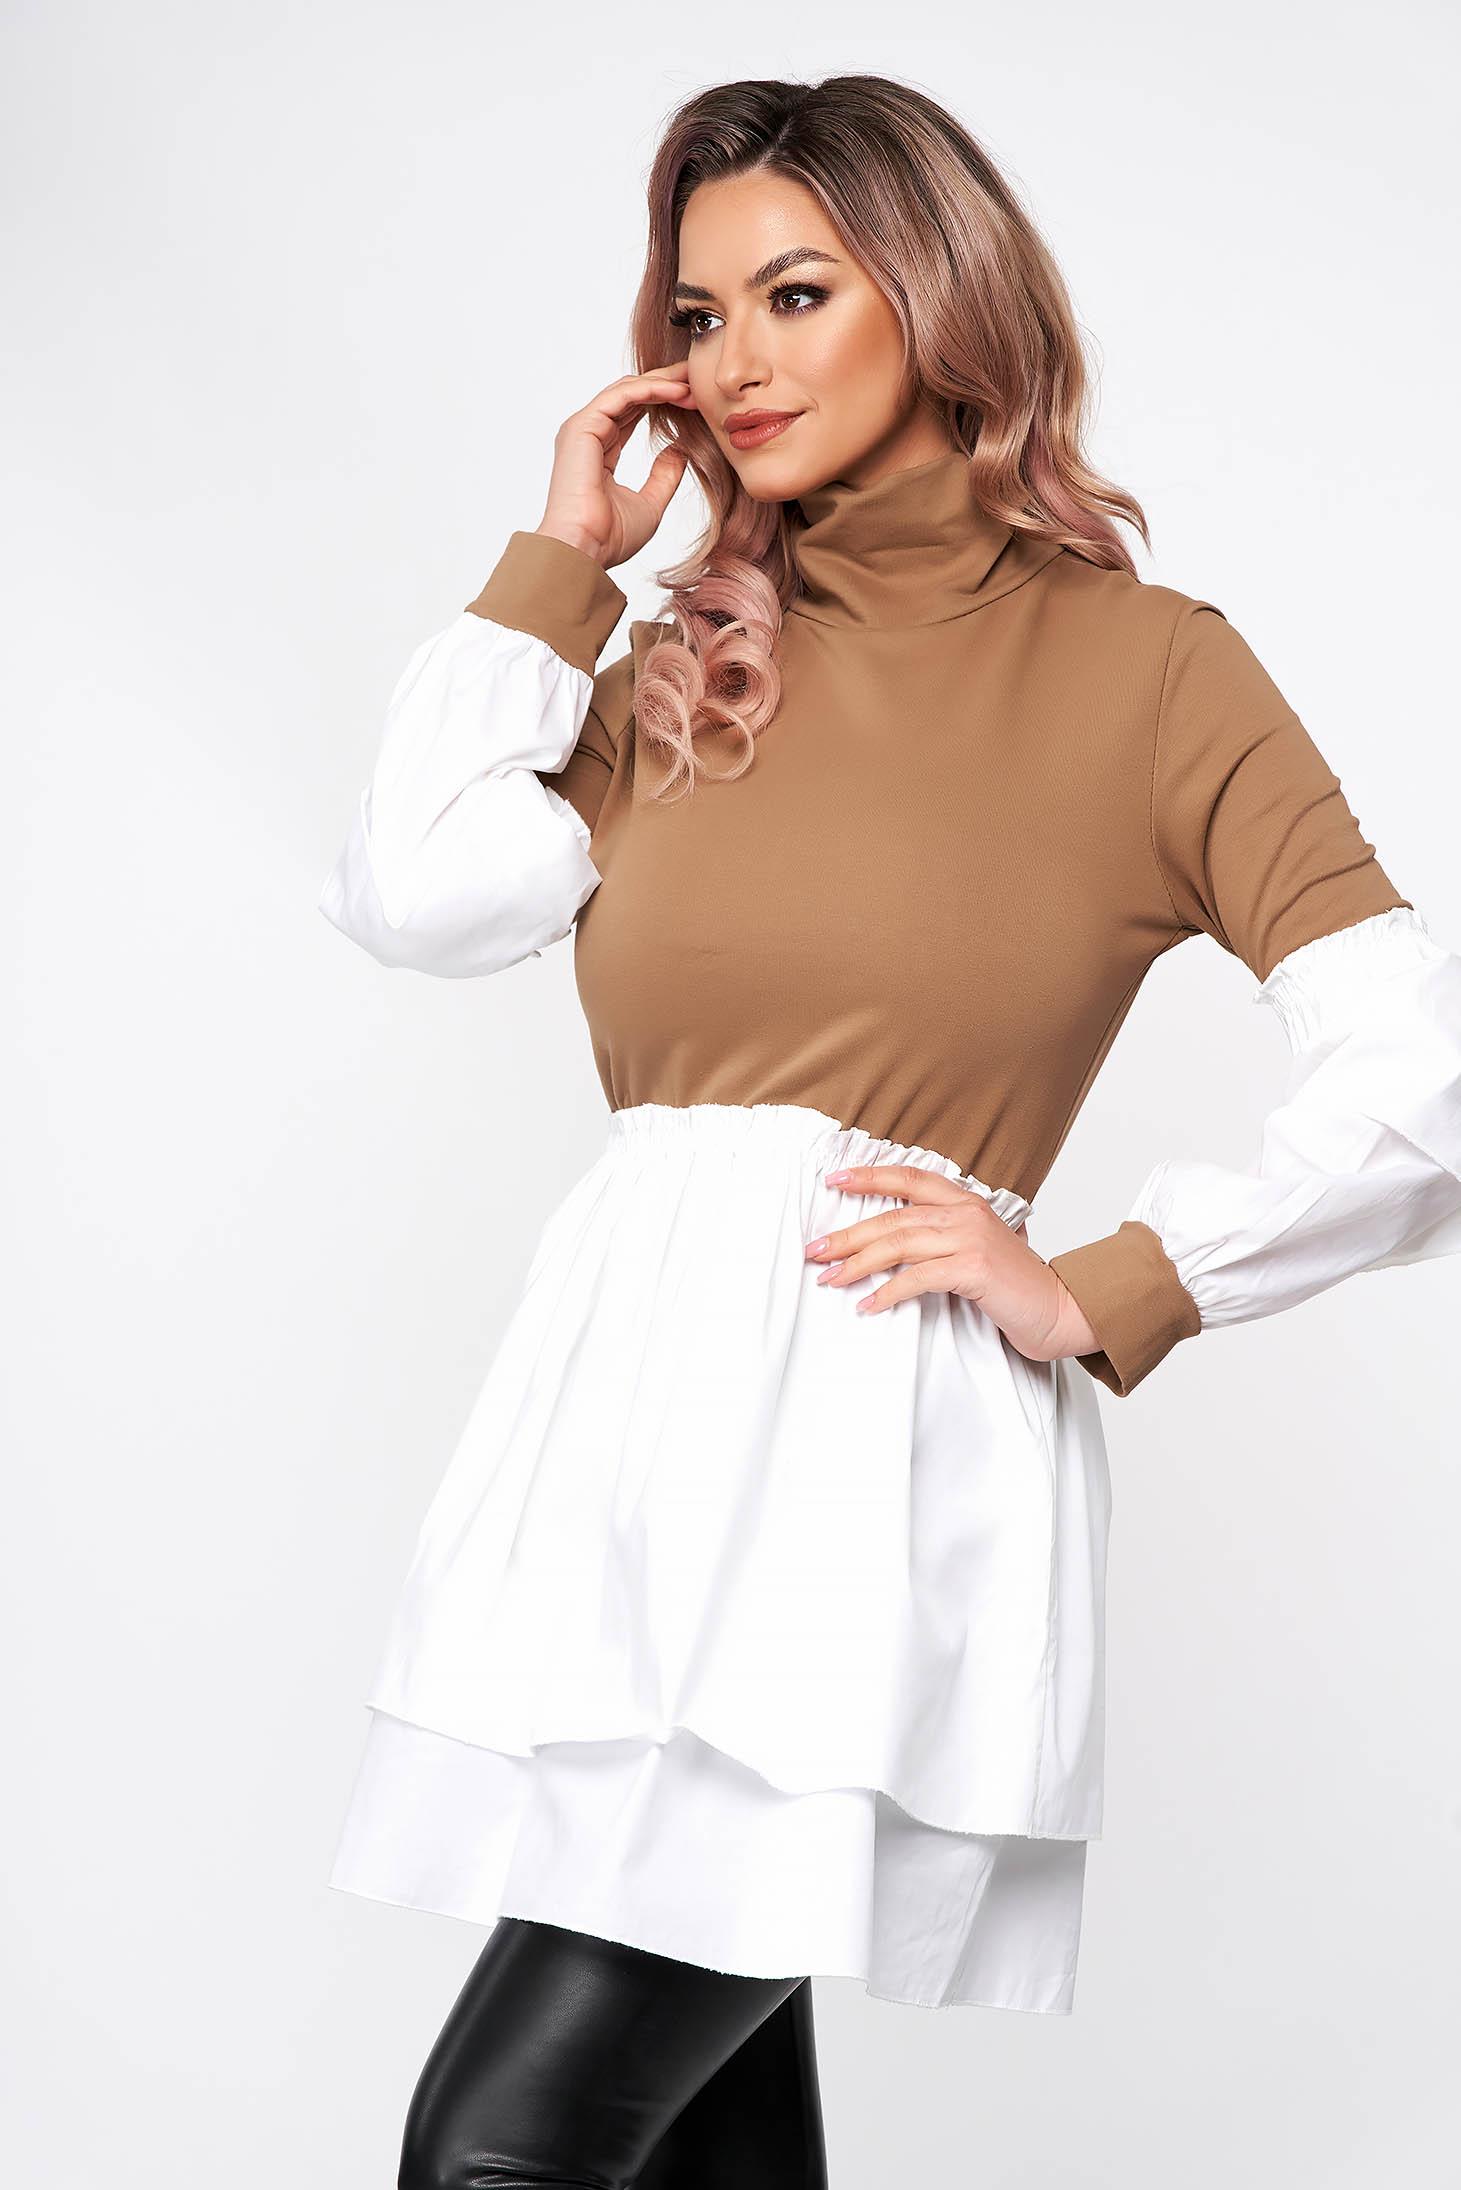 Cappuccino dress short cut turtleneck from elastic fabric